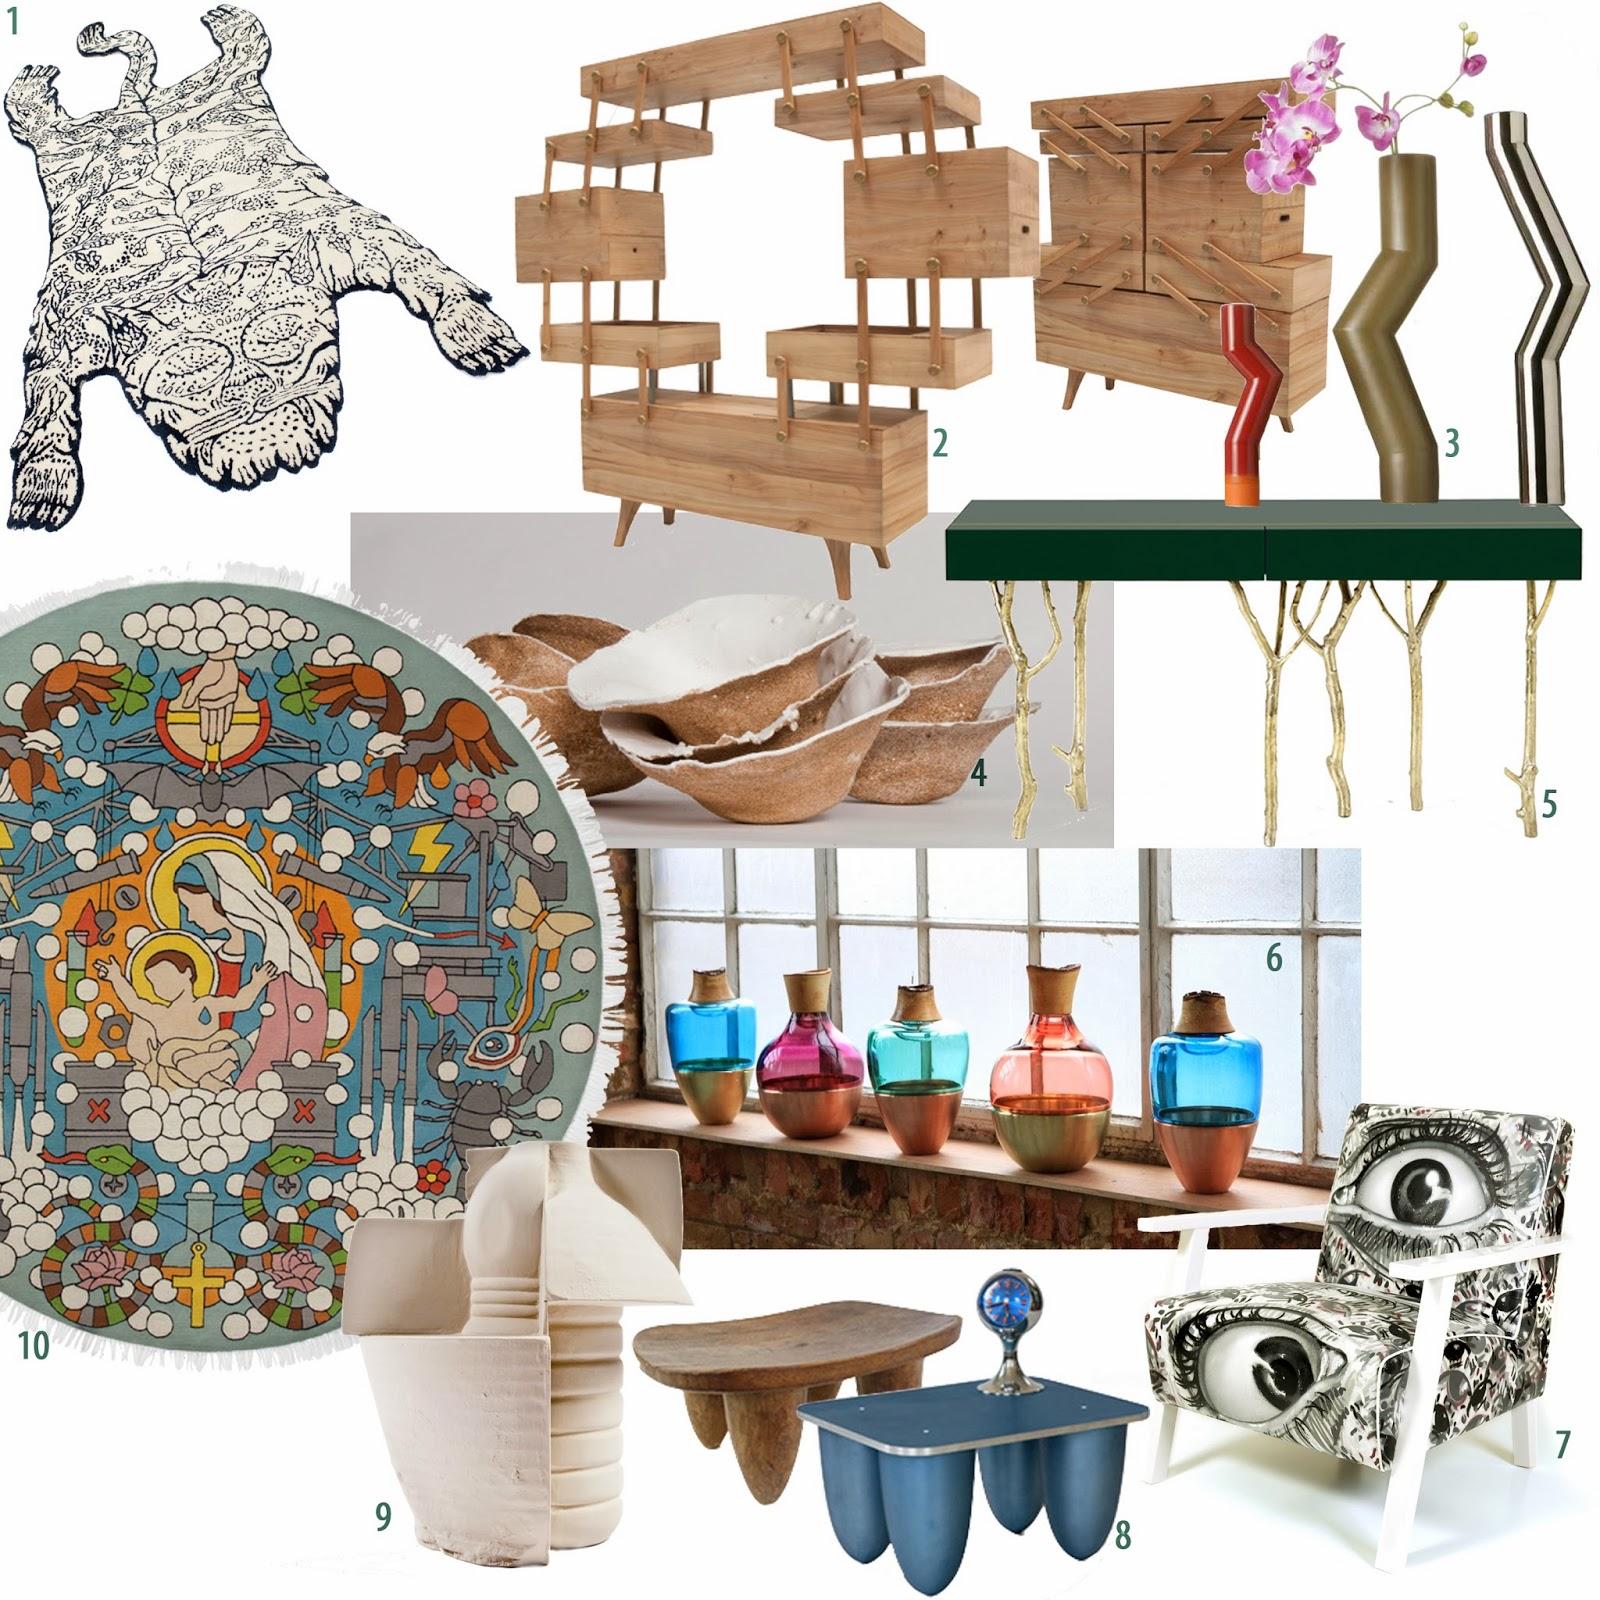 Shoppingvisadron: Frond